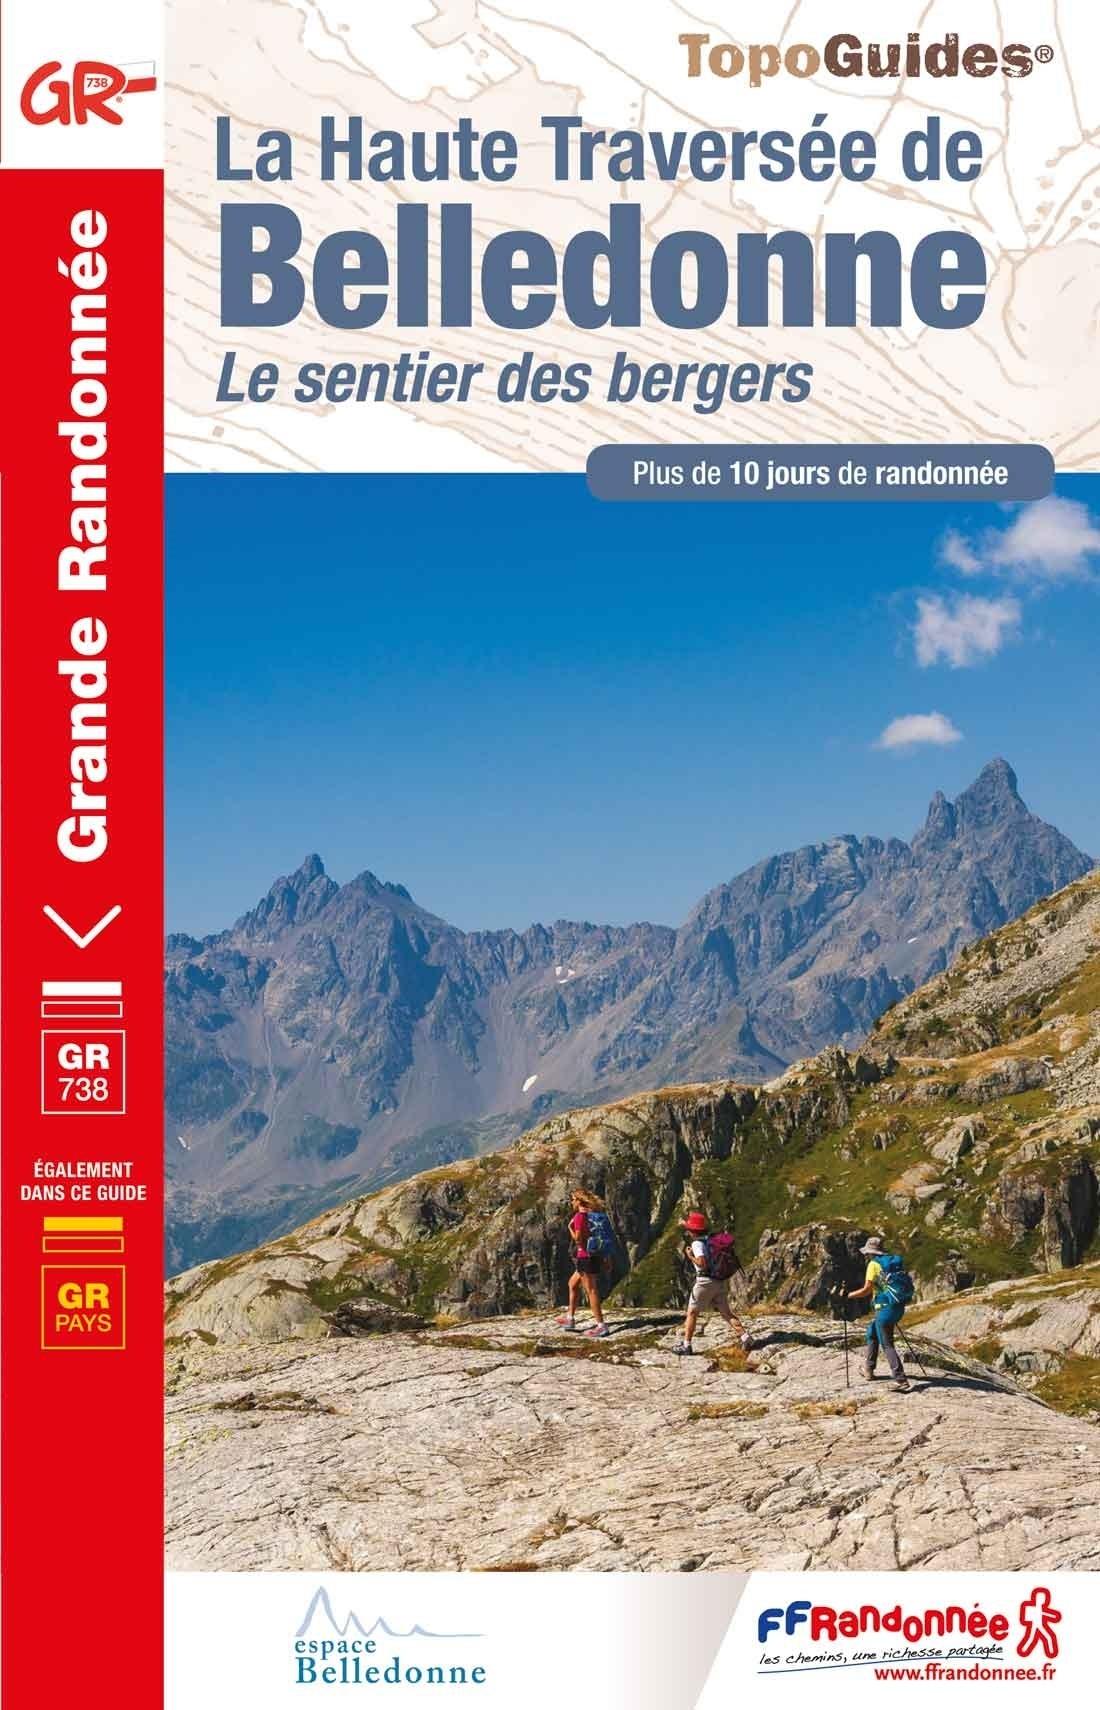 TG738 La Haute Traversée de Belledonne 9782751410505  FFRP Topoguides  Meerdaagse wandelroutes, Wandelgidsen Franse Alpen: noord